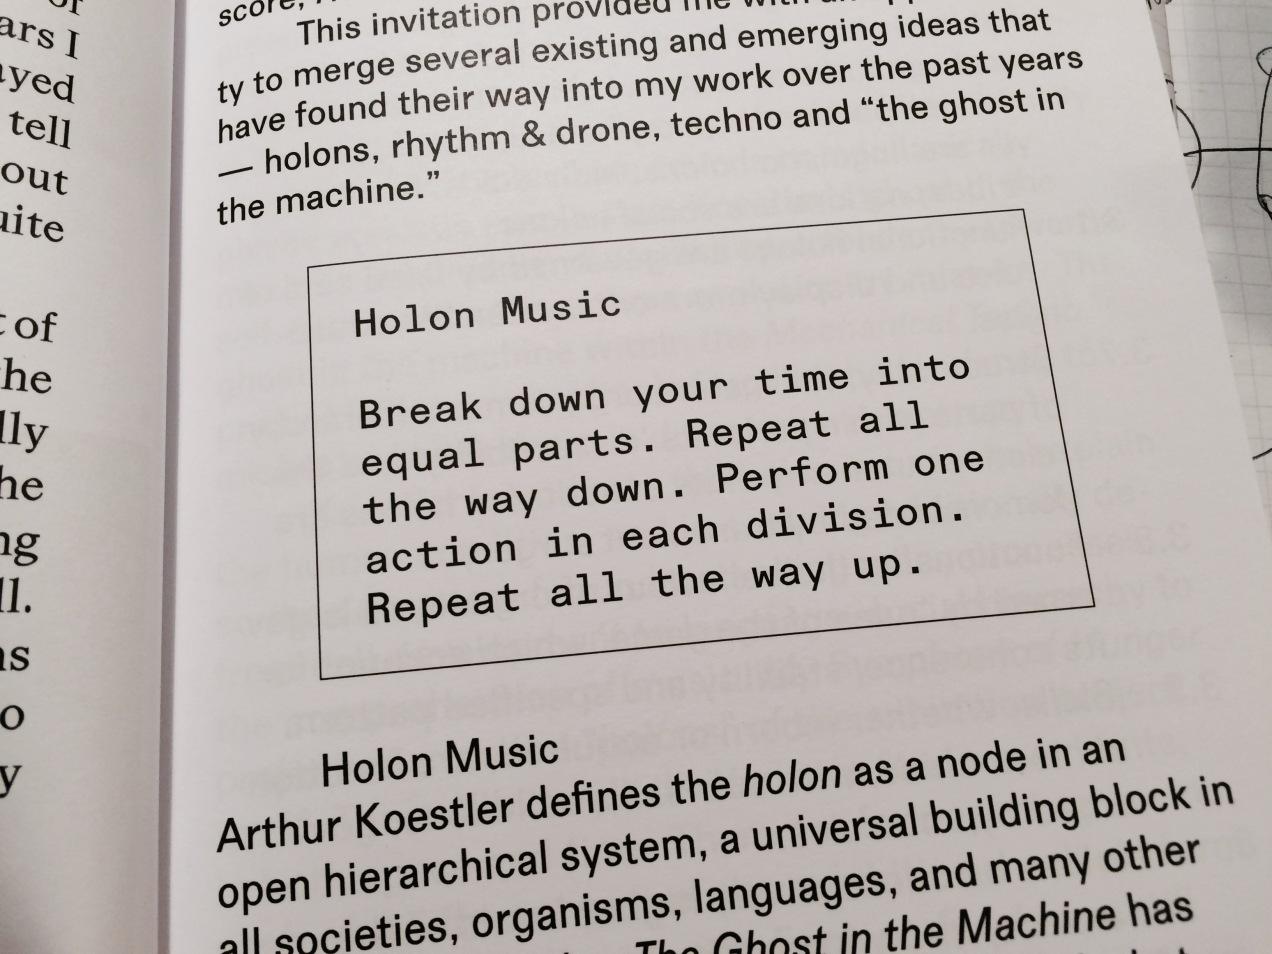 holon music score